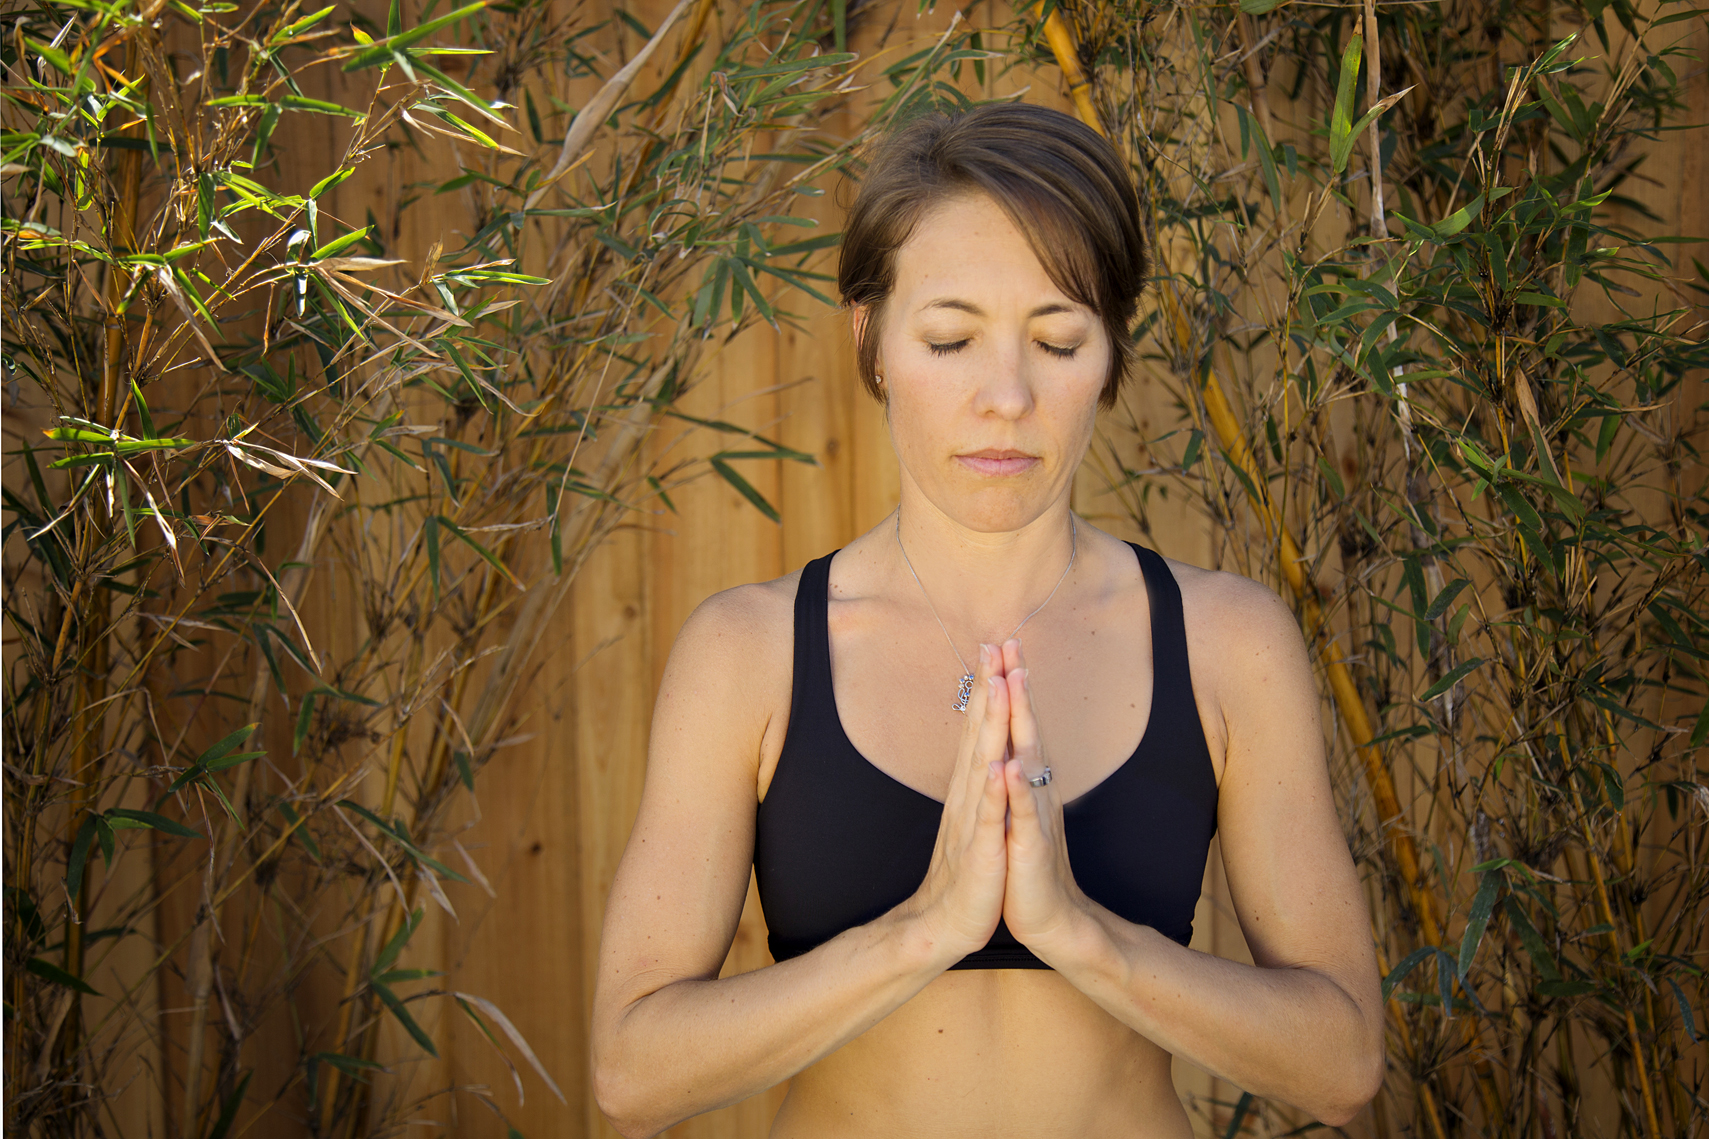 yoga_meditate_sarasota_photography_pose